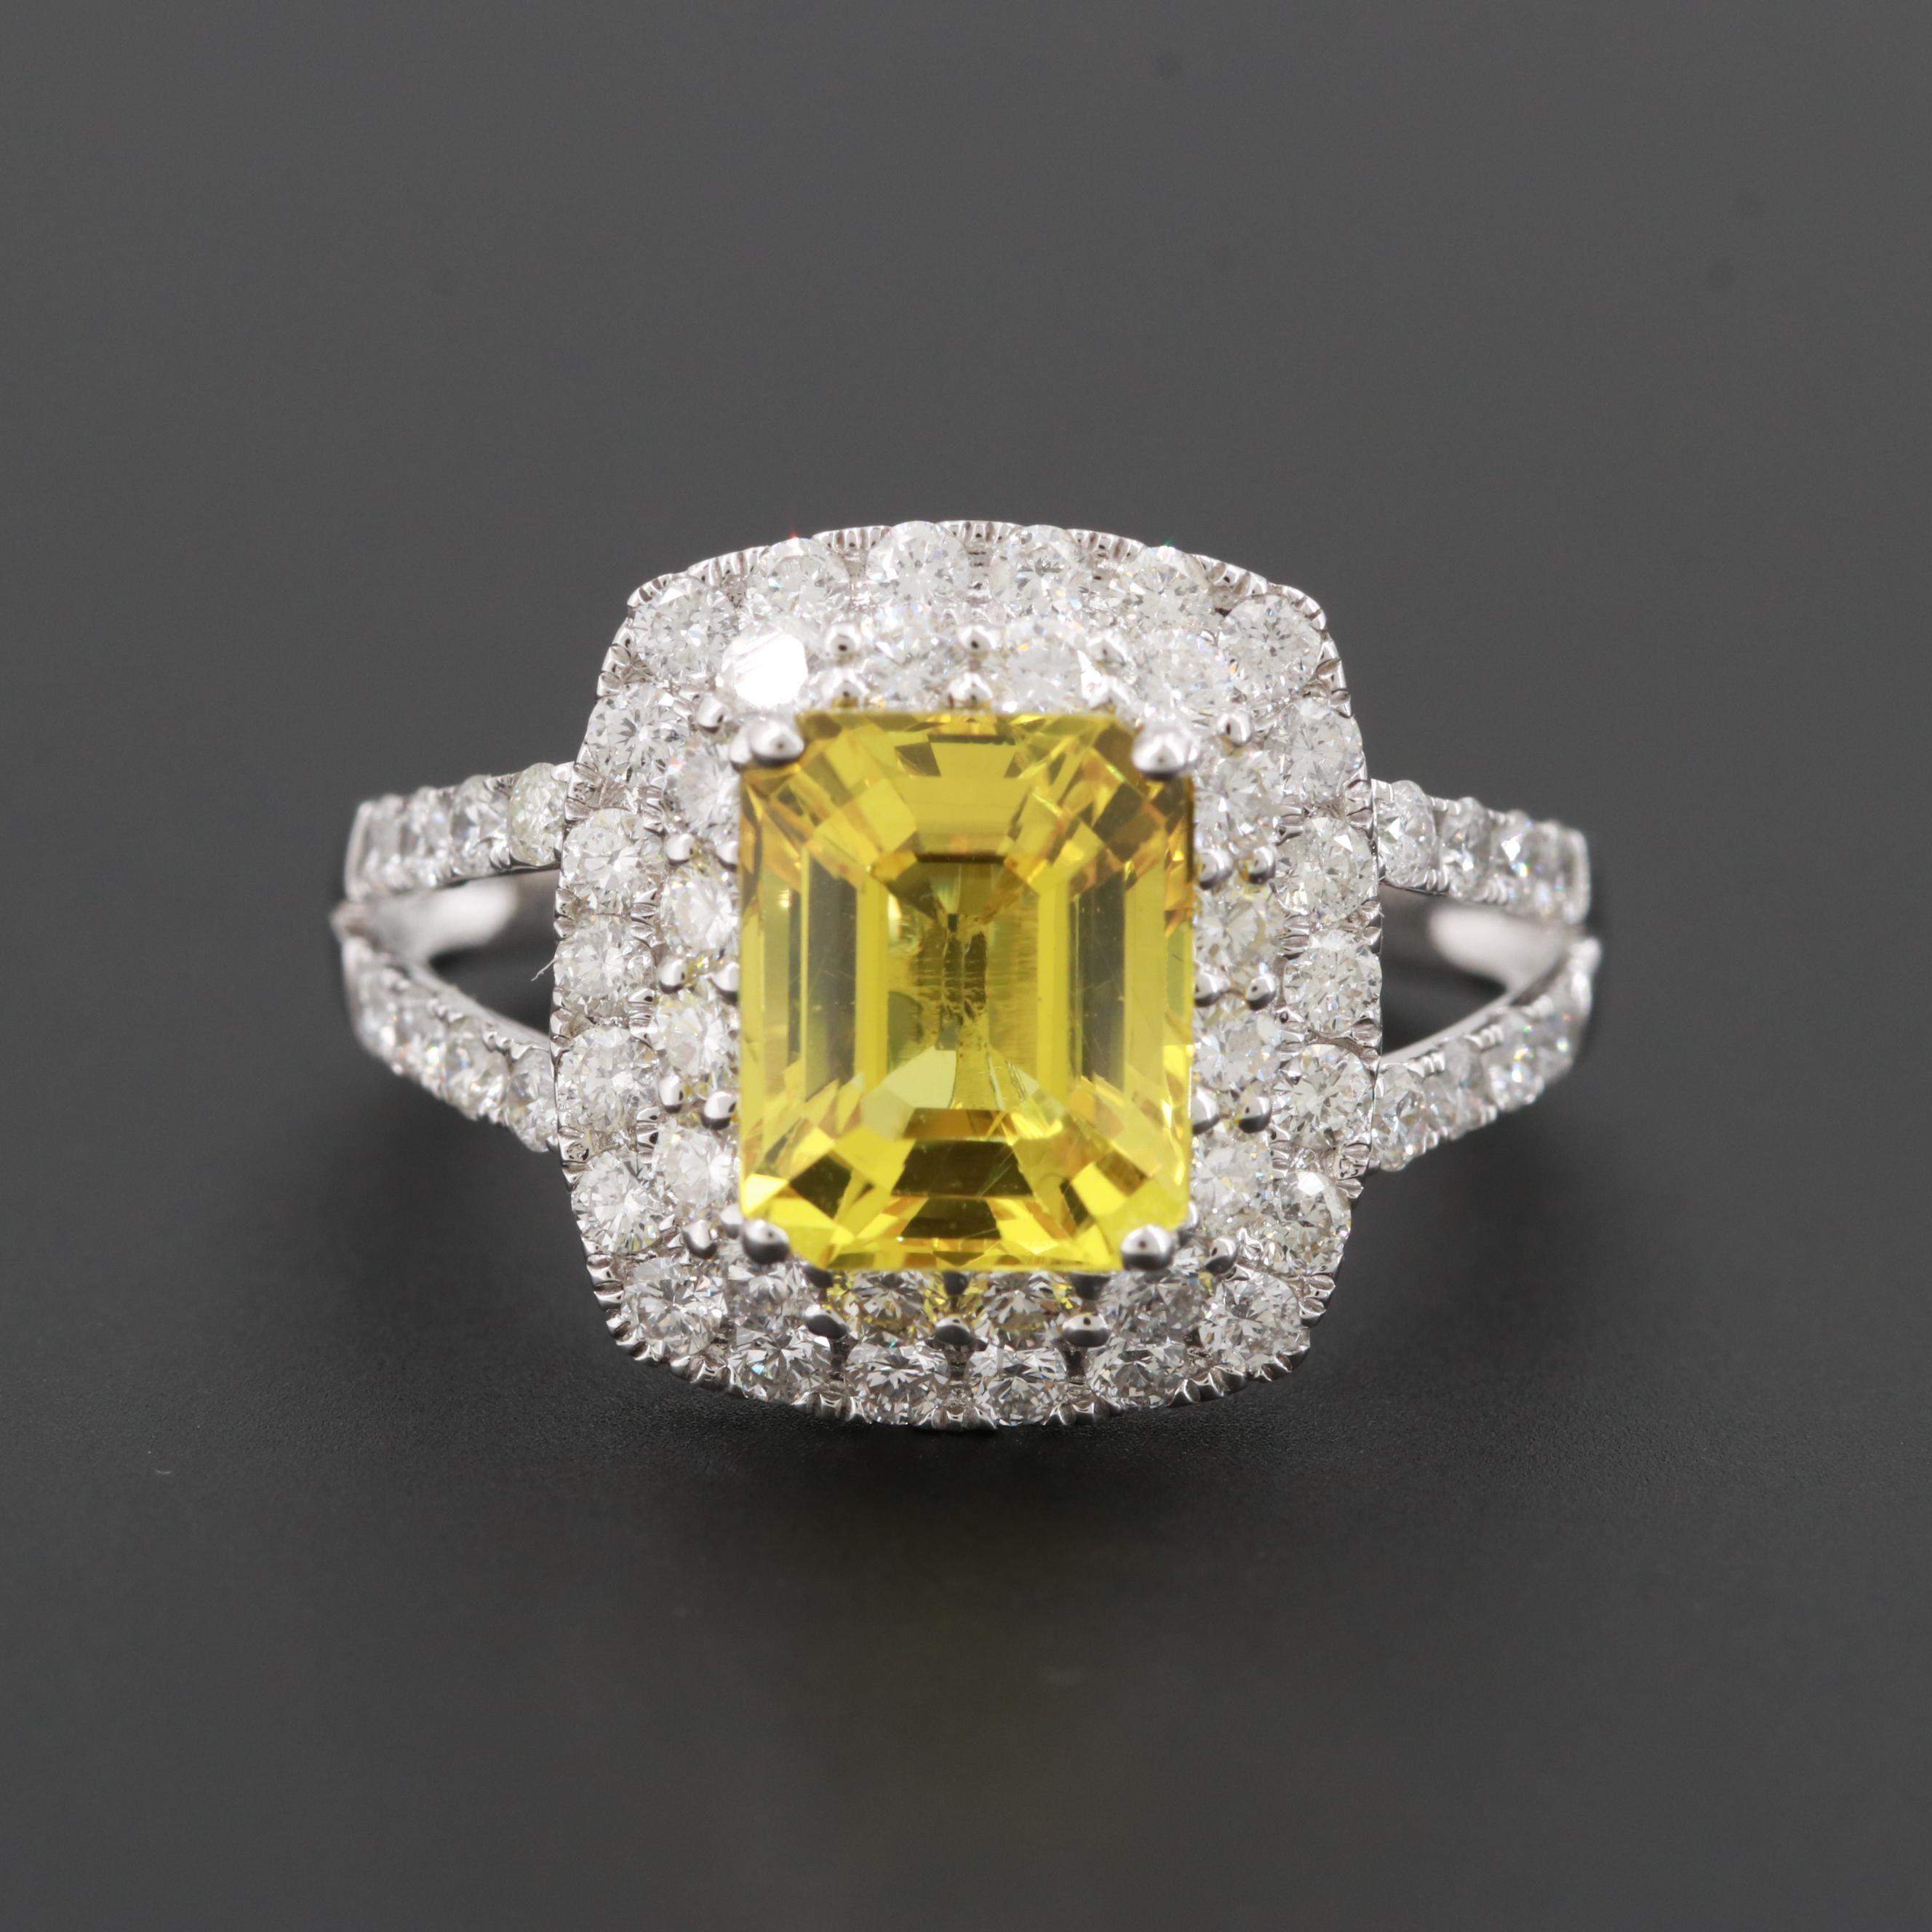 18K White Gold 2.72 CT Yellow Sapphire and 1.01 CTW Diamond Ring